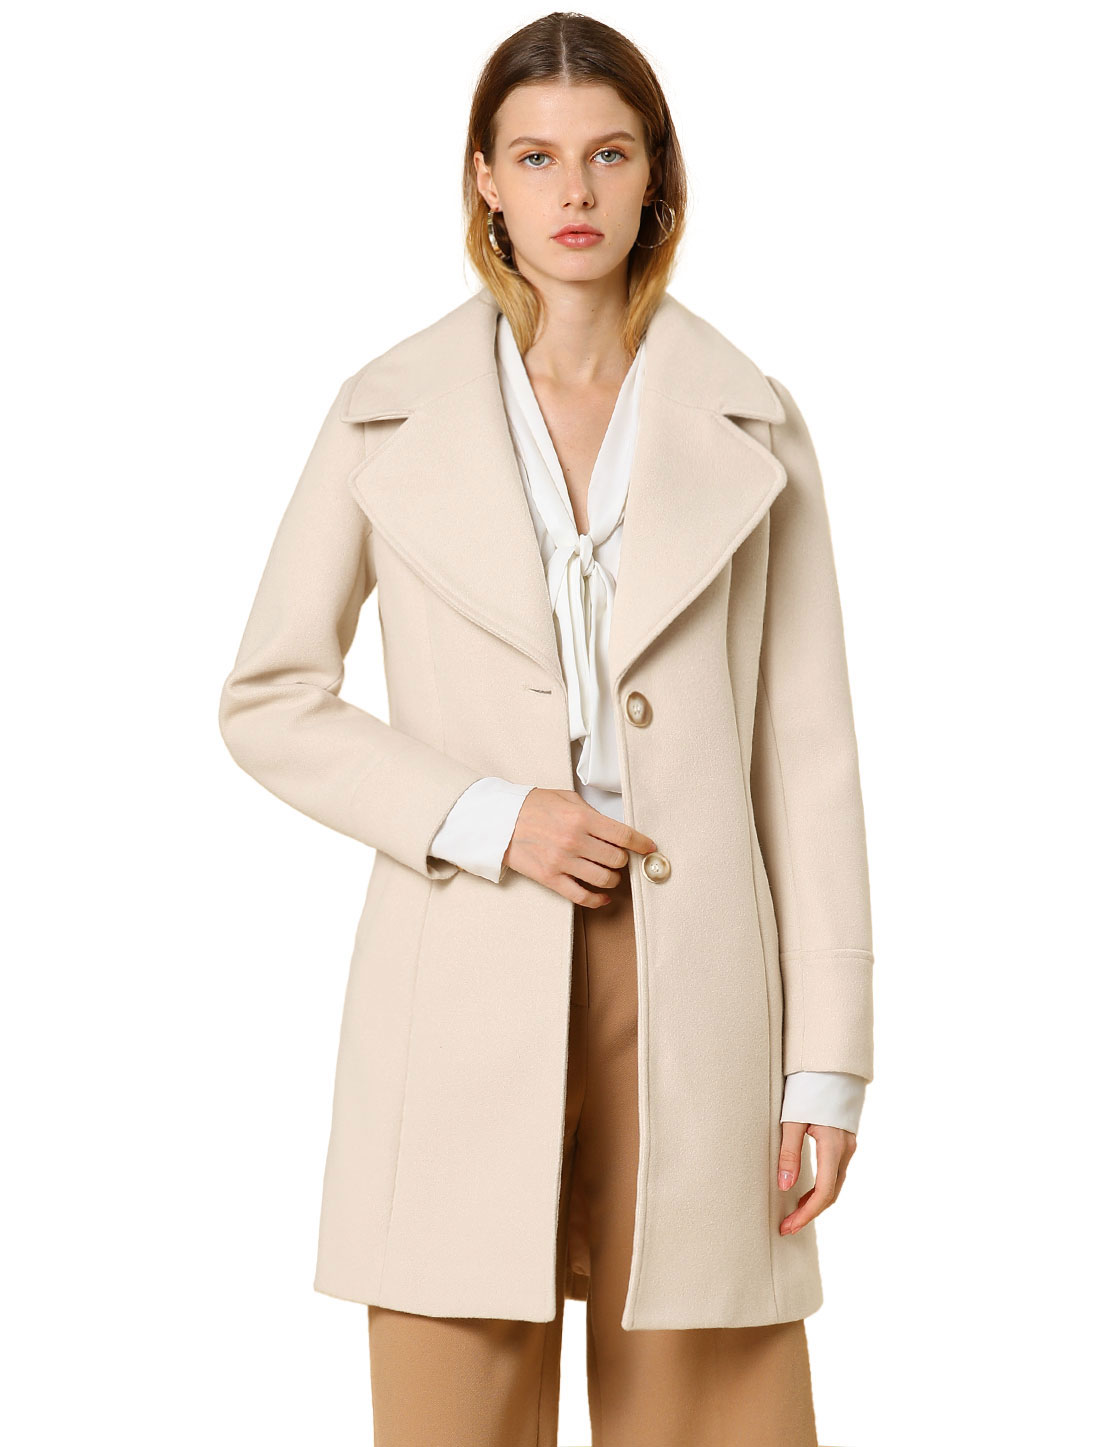 Allegra K Women's Elegant Notched Lapel Button Winter Trench Coat Off-White M